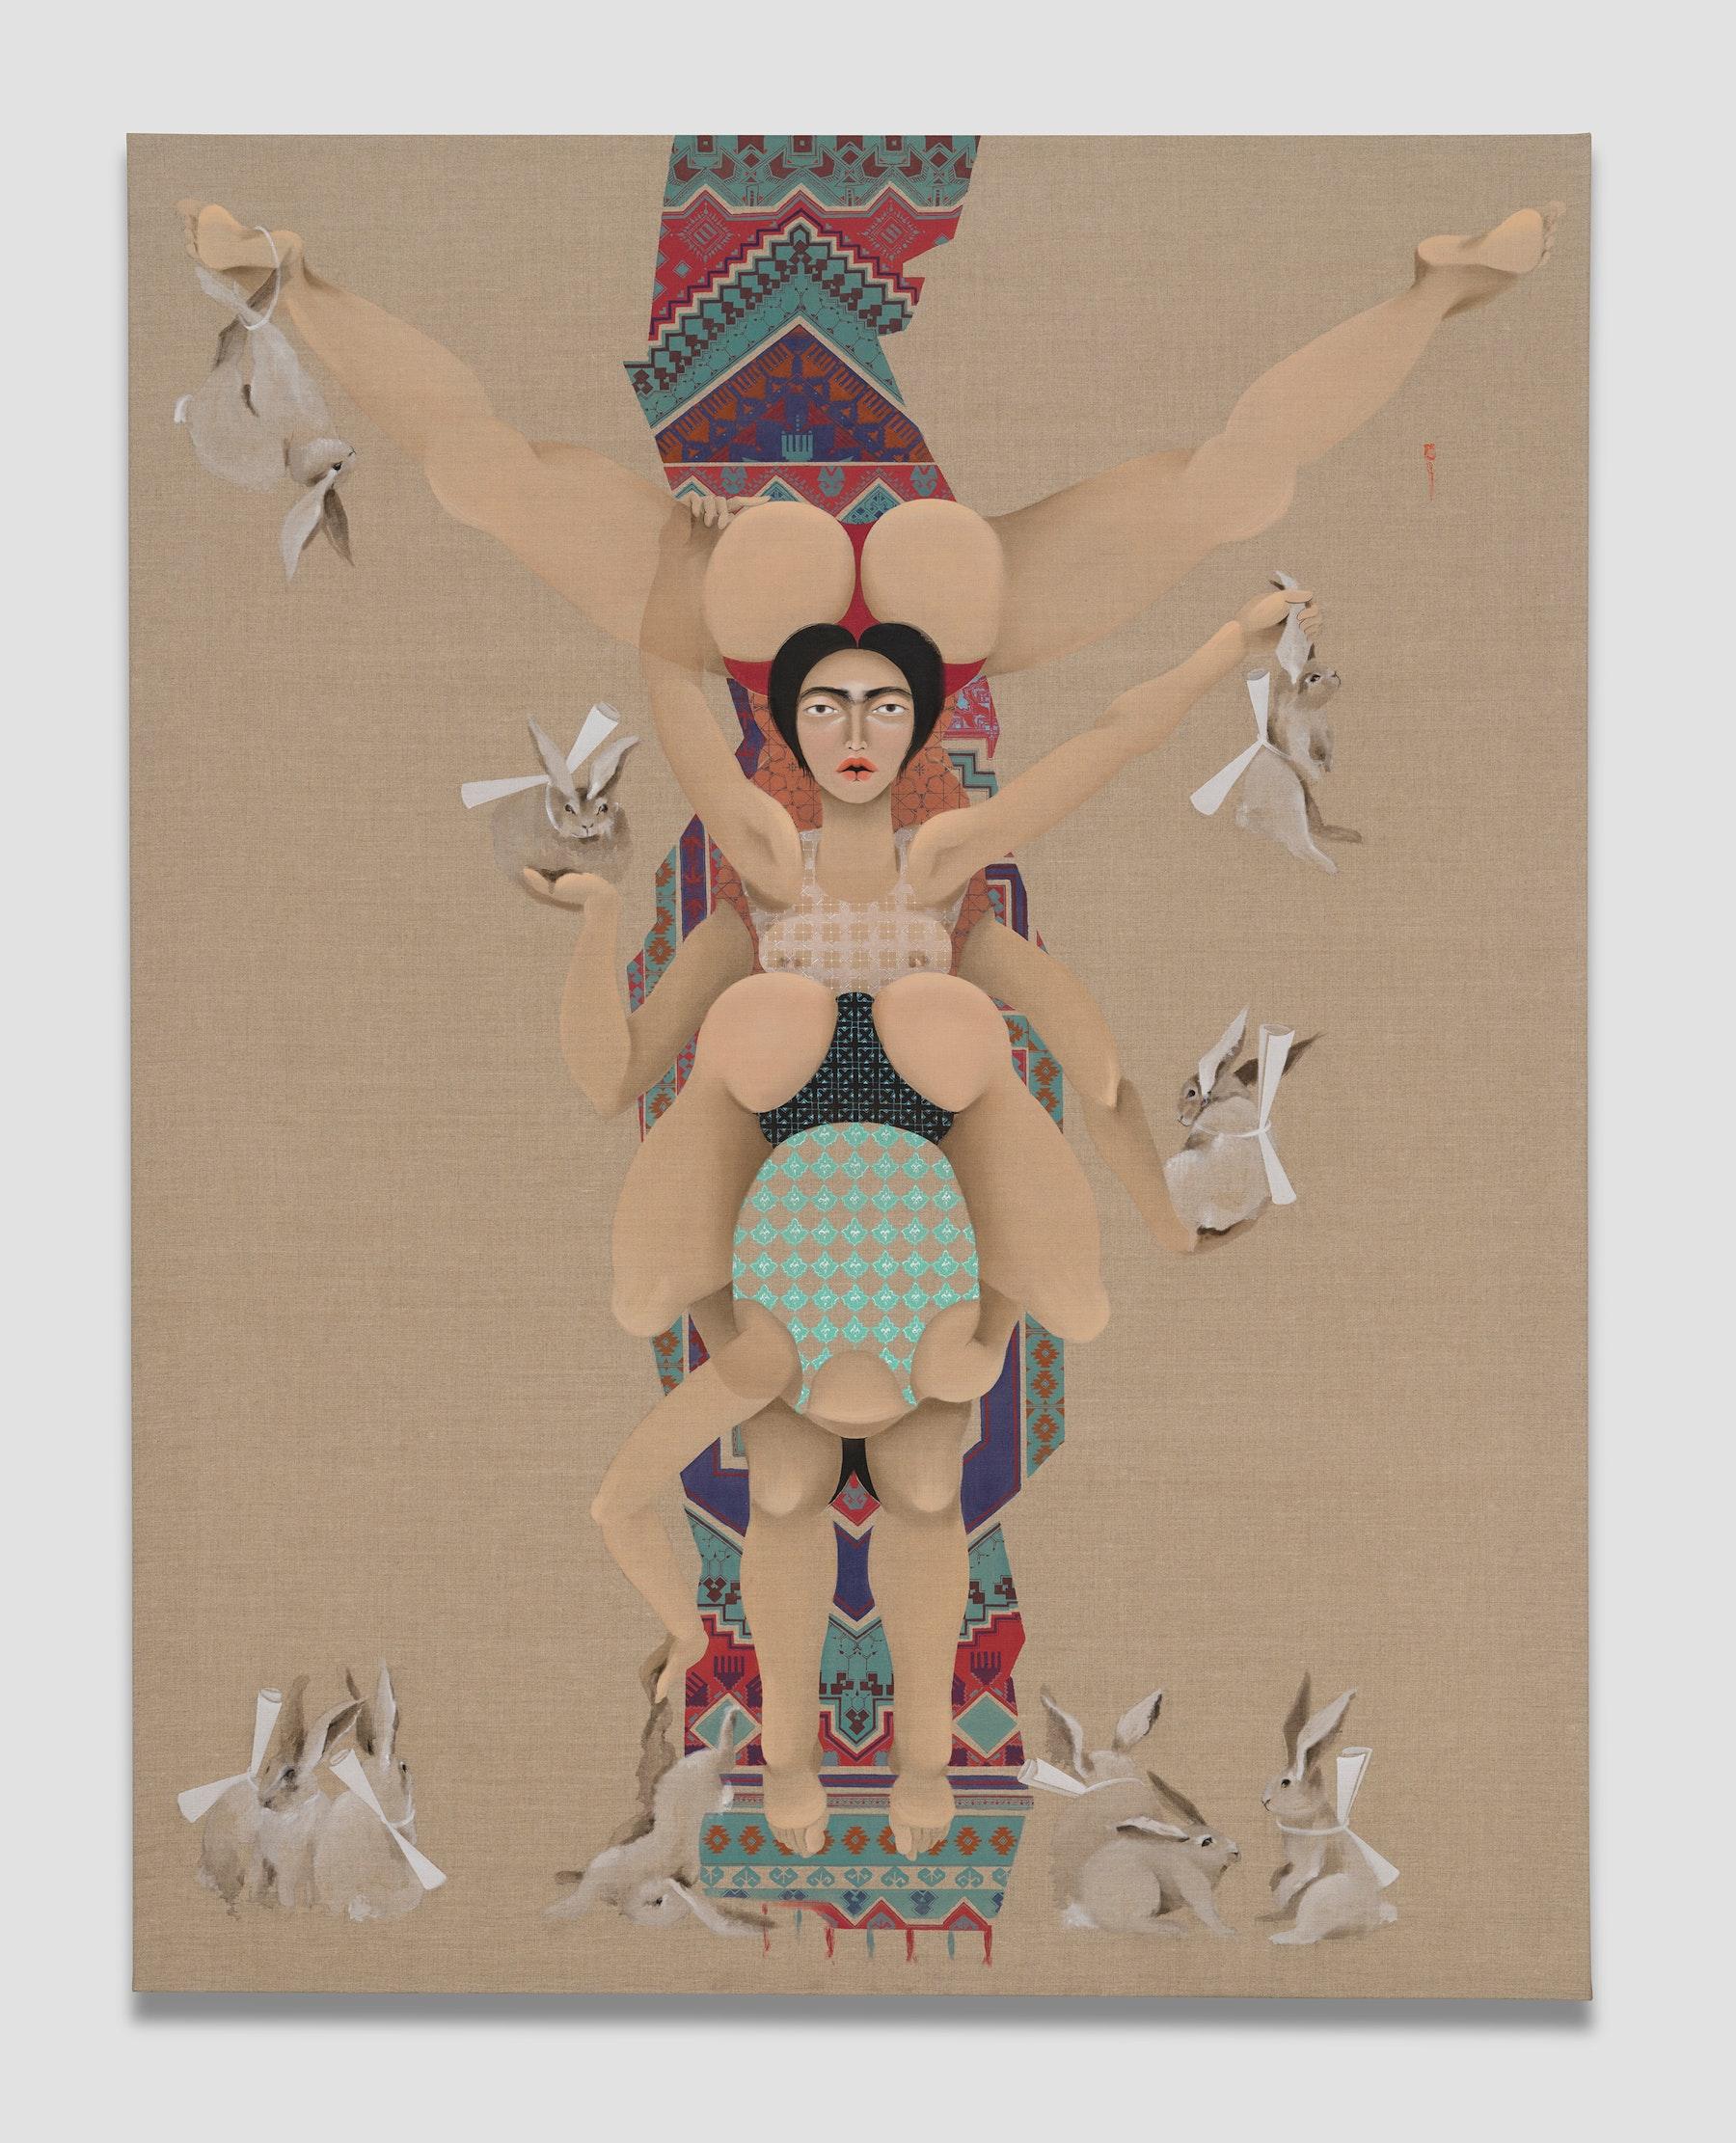 "Hayv Kahraman ""Bunnies,"" 2021 Oil on linen 77"" x 60"" [HxW] (195.58 x 152.4 cm) Inventory #KAR182 Courtesy of the artist and Vielmetter Los Angeles Photo credit: Jeff Mclane"